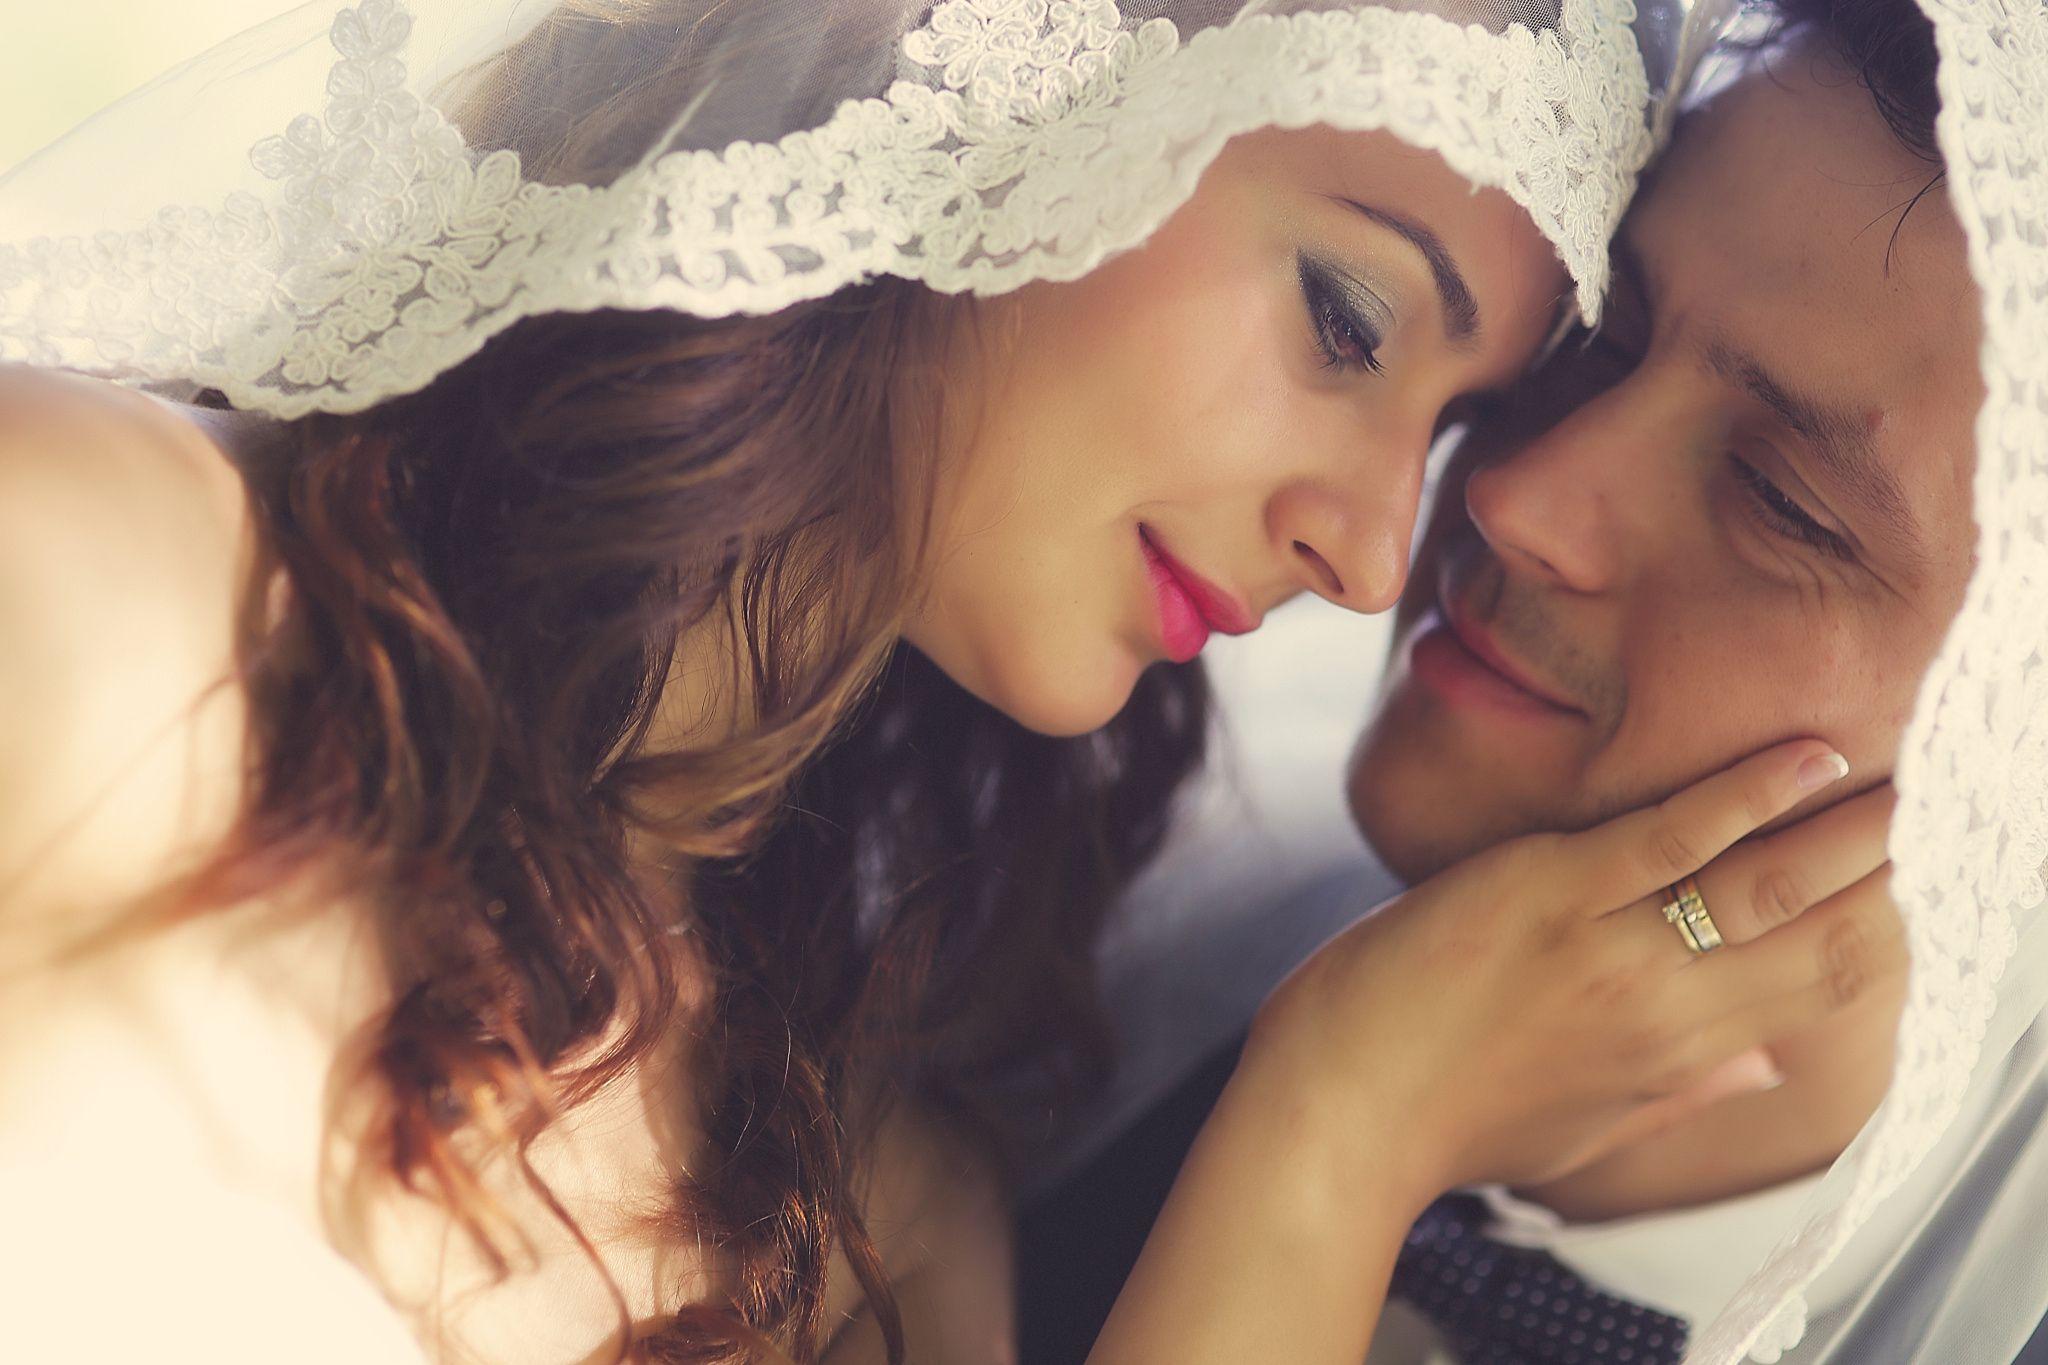 wedding day by Alexandru Vilceanu on 500px